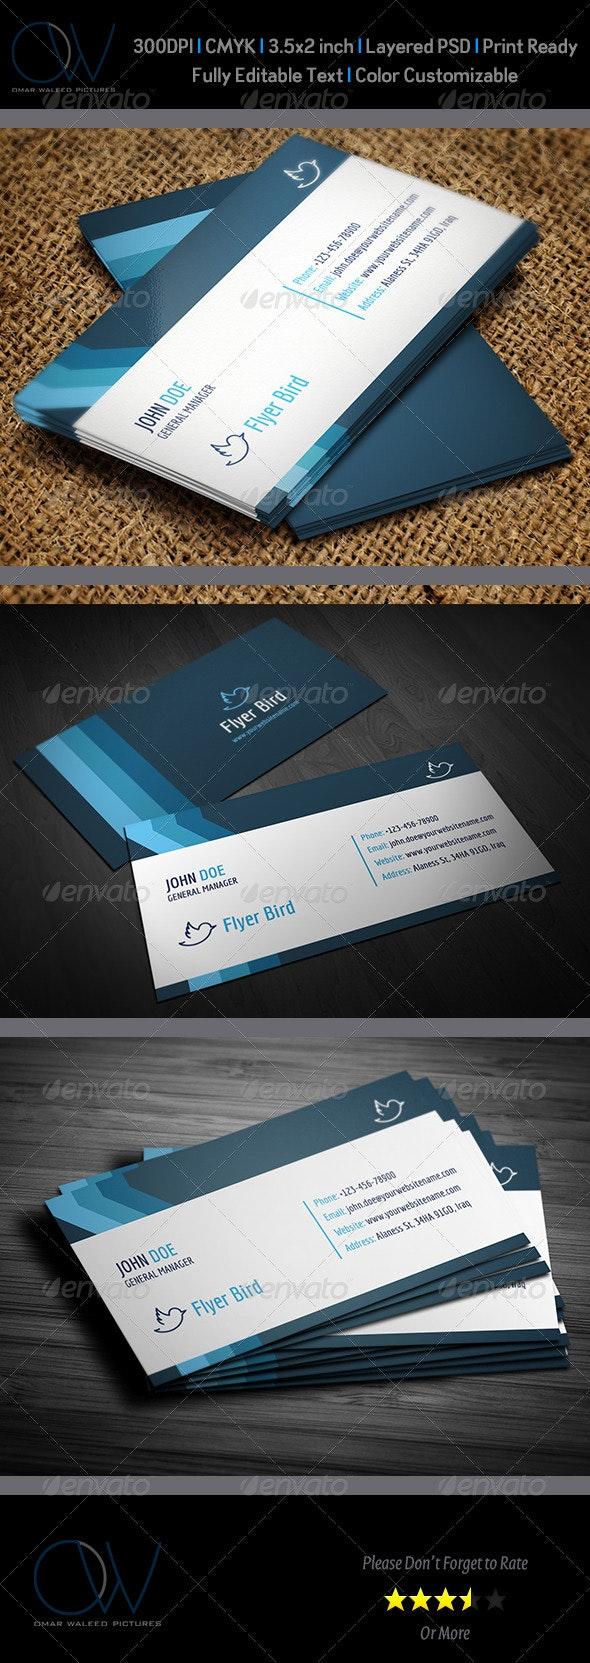 Corporate Business Card Vol.16 - Corporate Business Cards